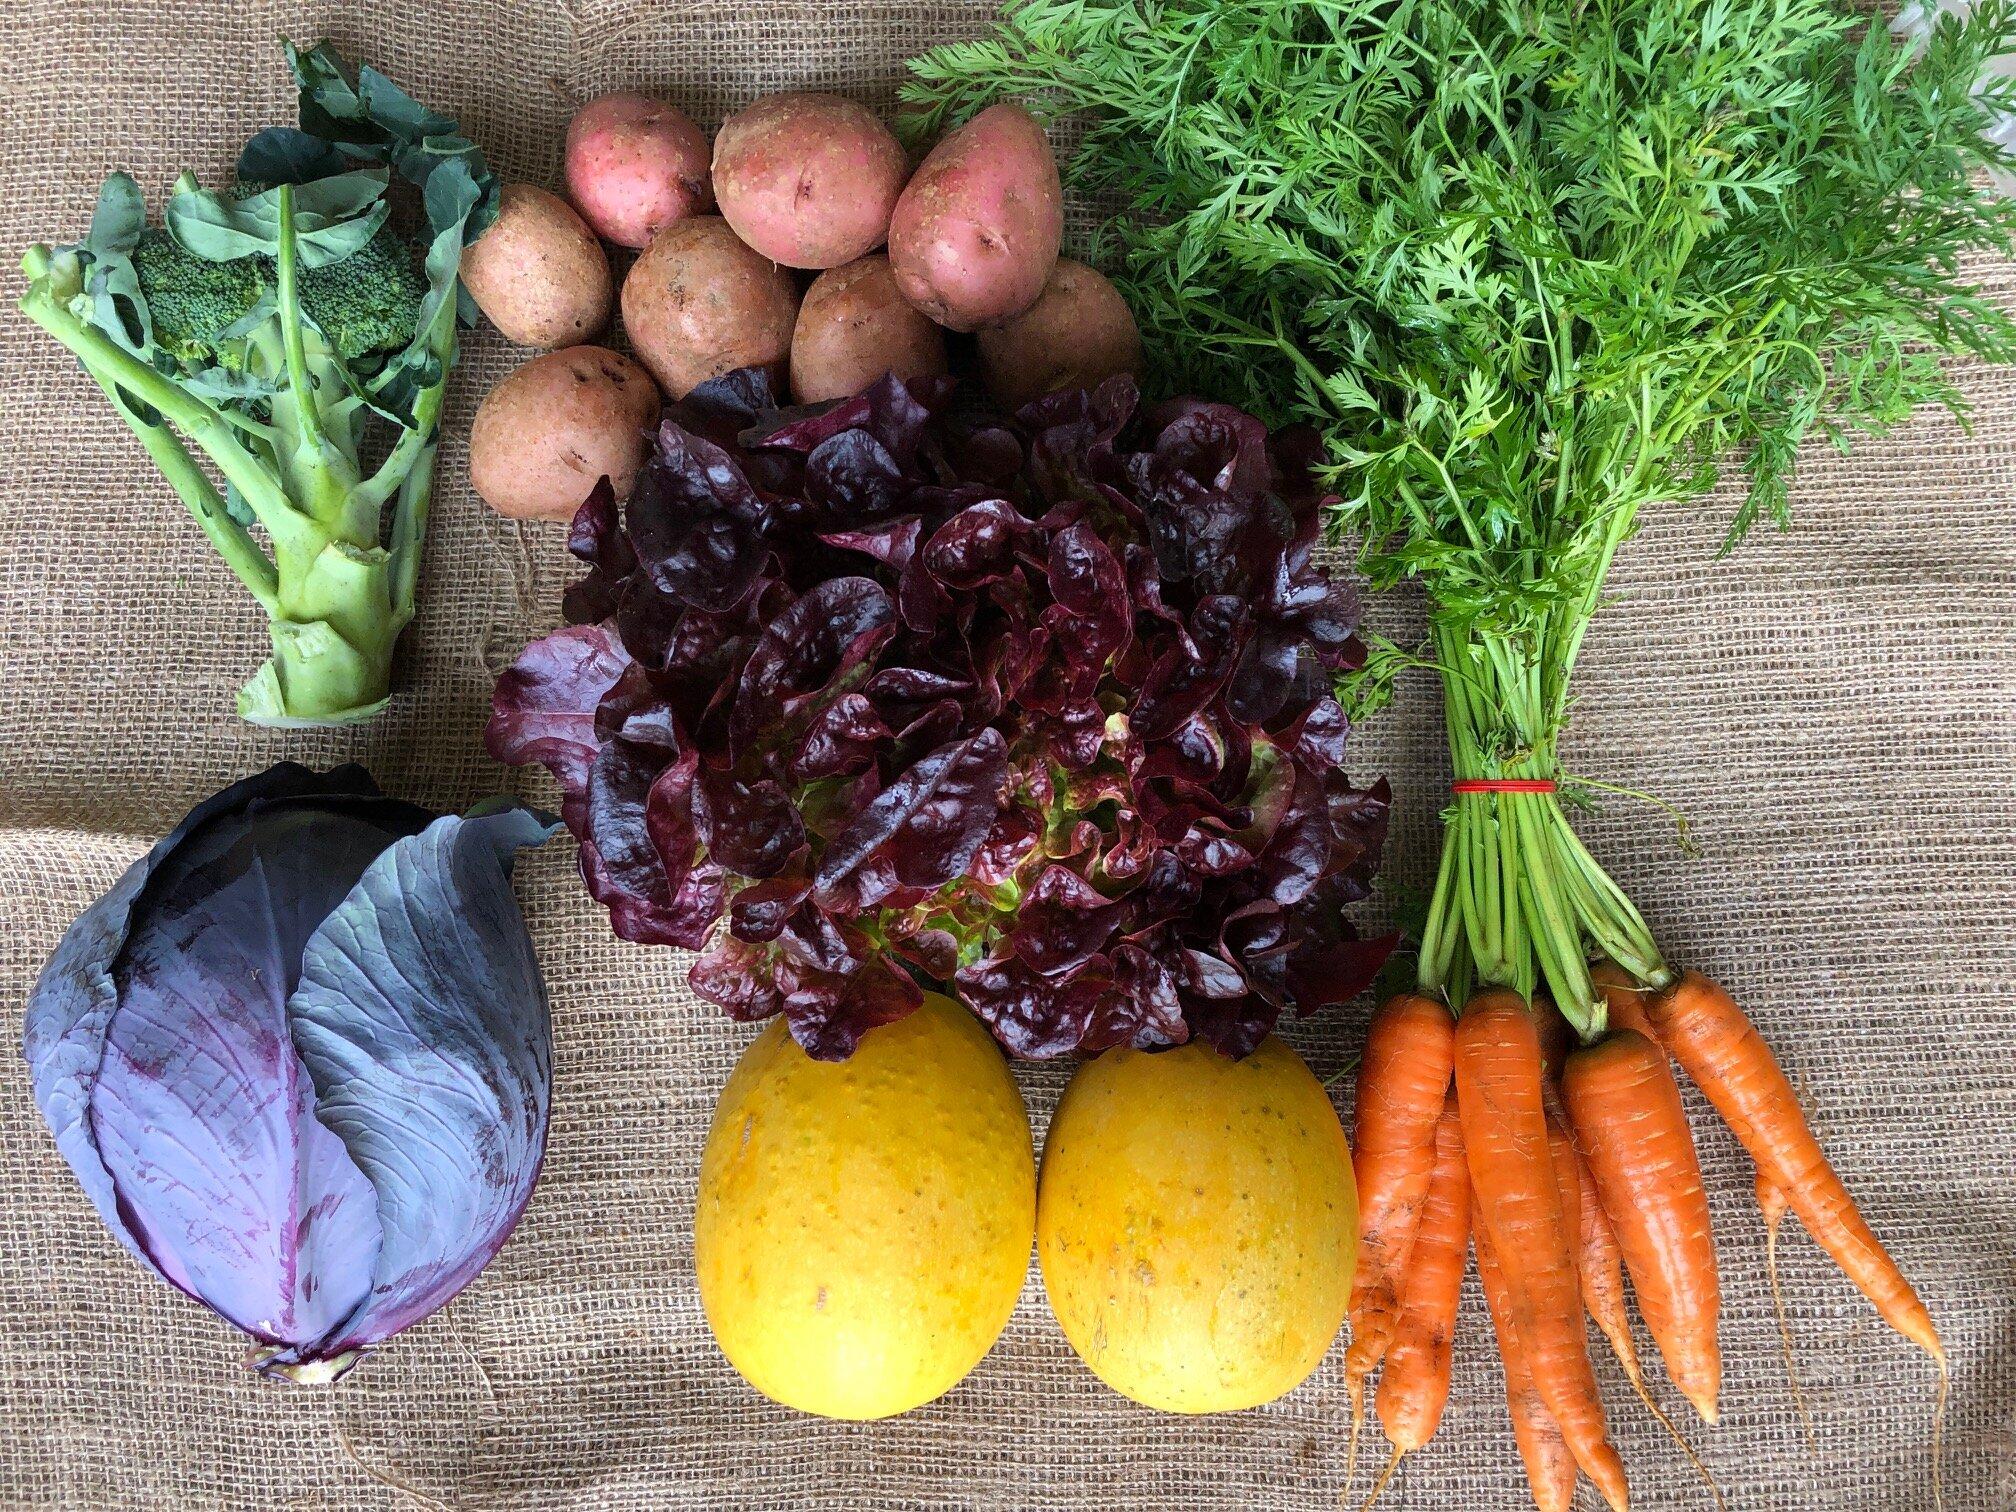 WEEK 1   1 head Red Cabbage  1 bunch Carrots  2 Spaghetti Squash  1 head Lettuce  1 head Broccoli  2 lbs Sweet Potatoes